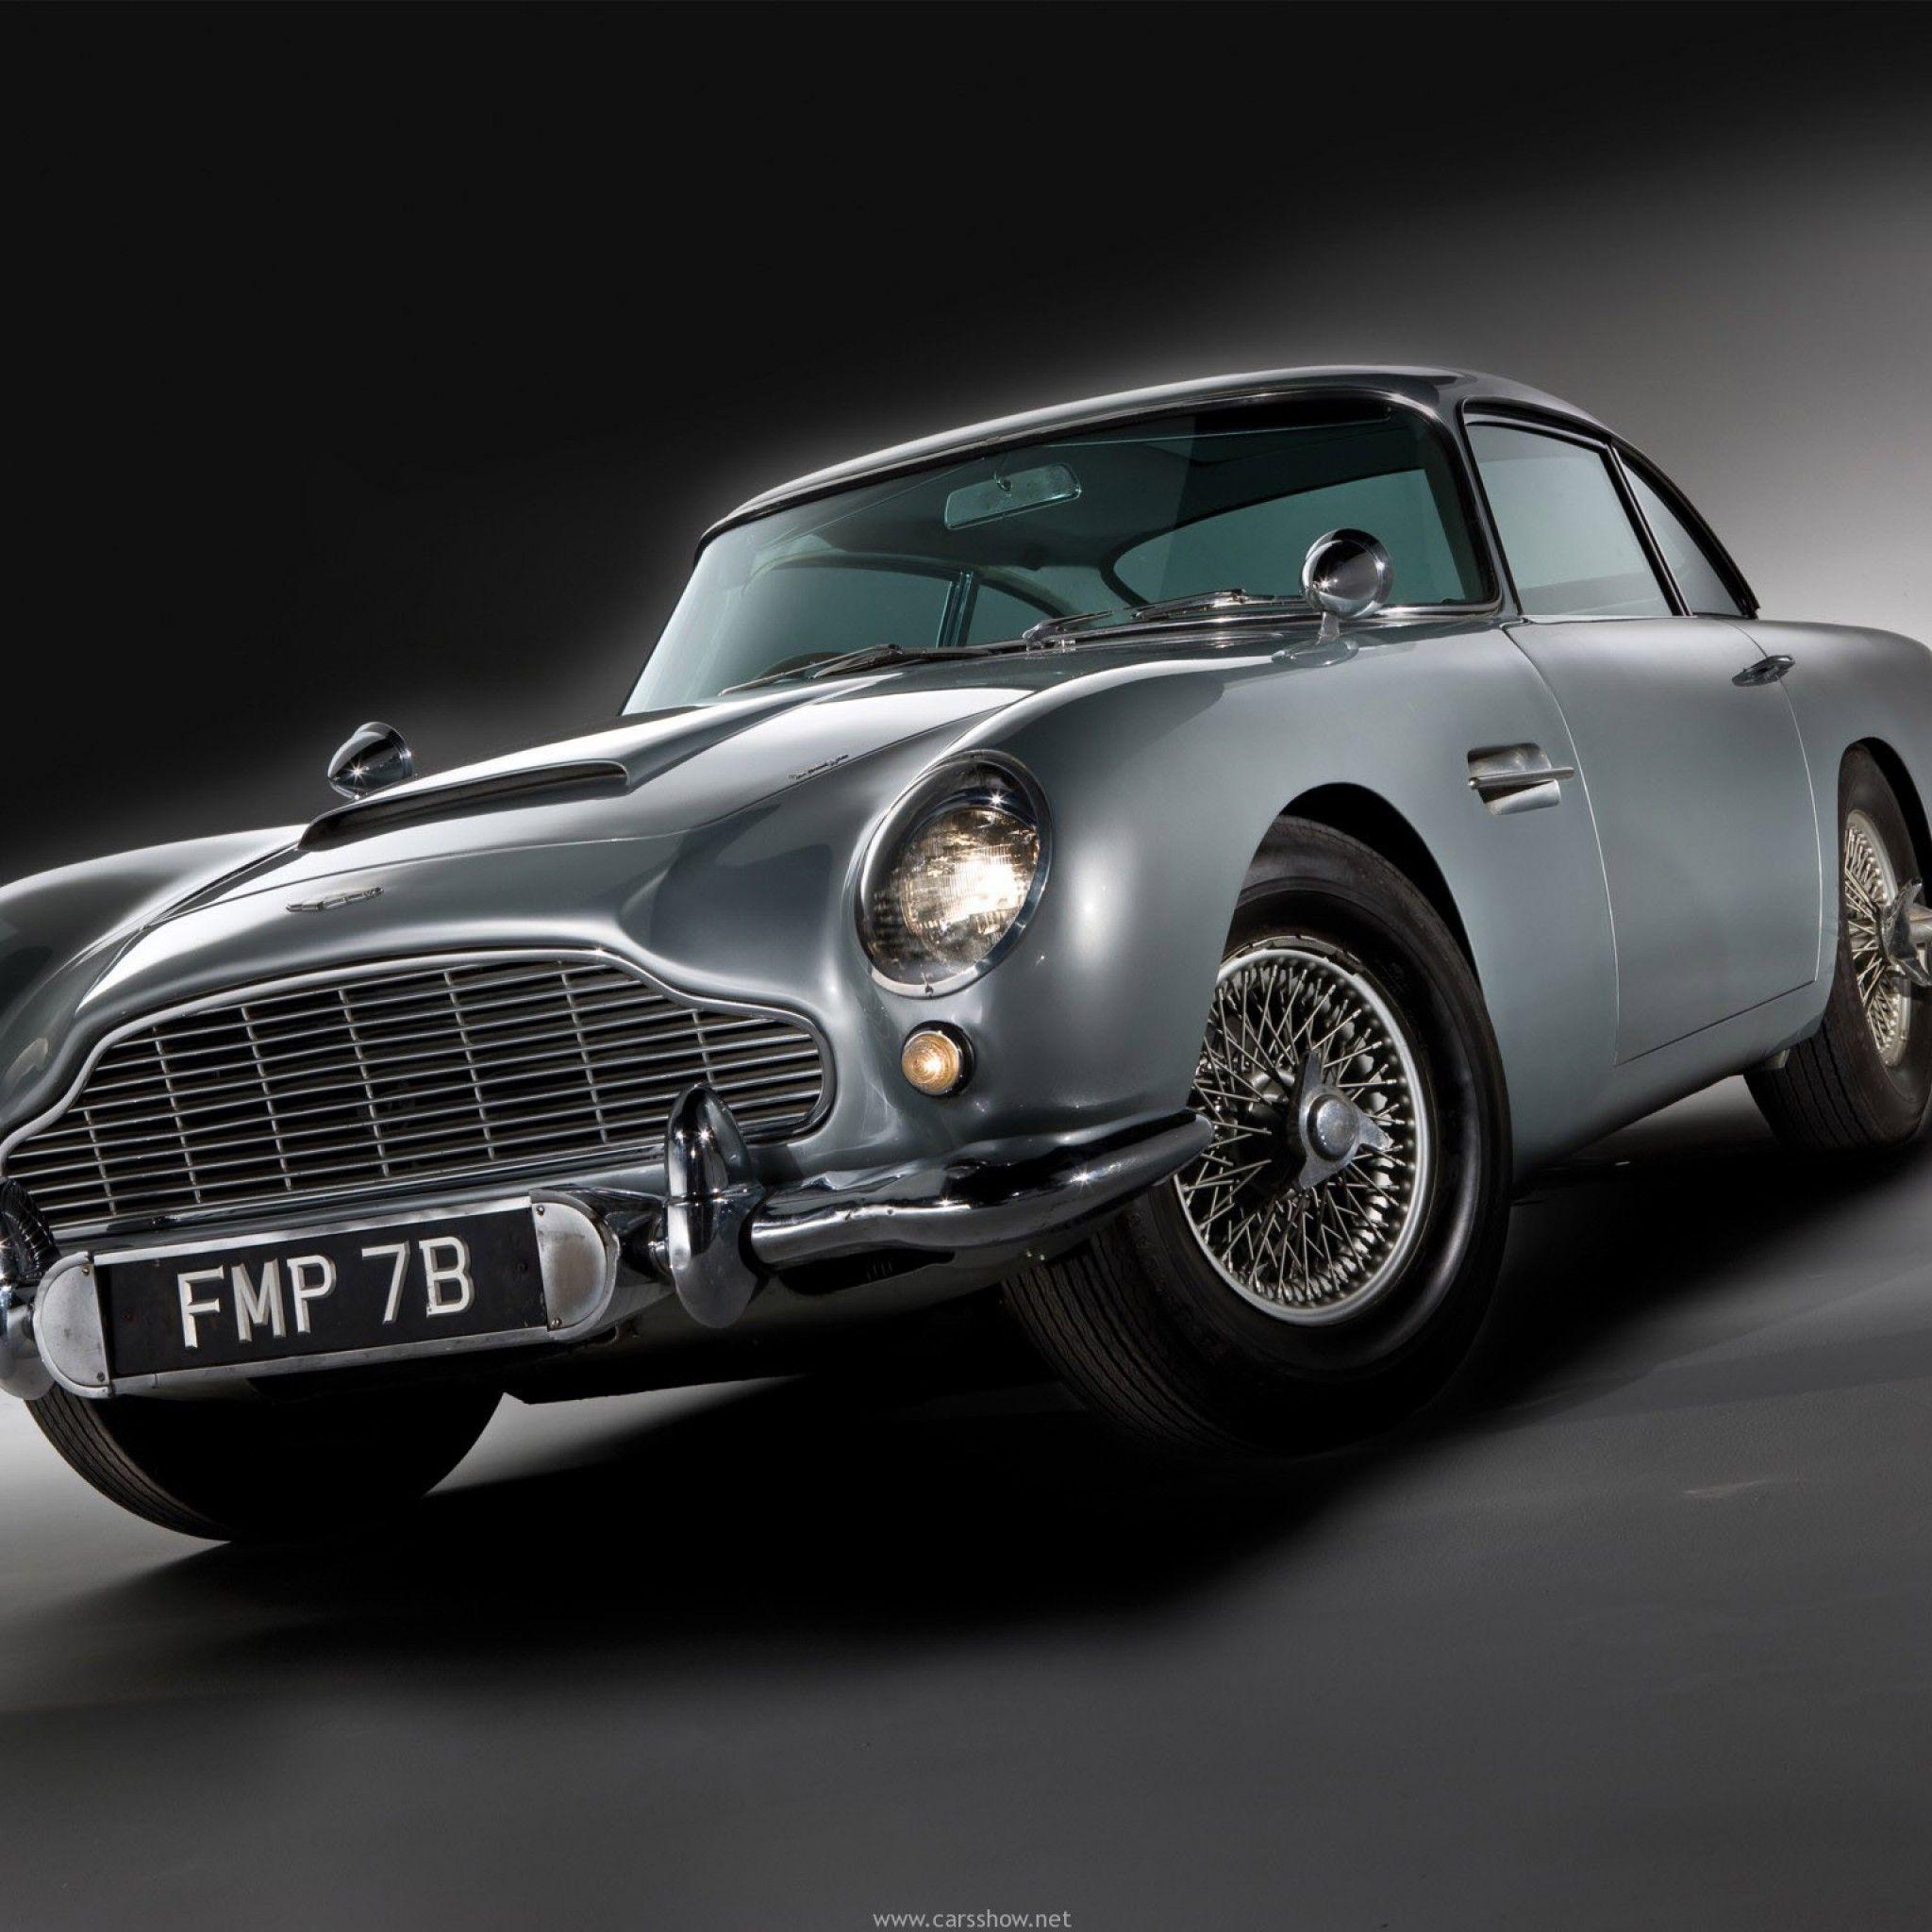 Aston Martin Db5: 1964-Aston-Martin-DB5-front-angle-view-2048x2048.jpg (2048